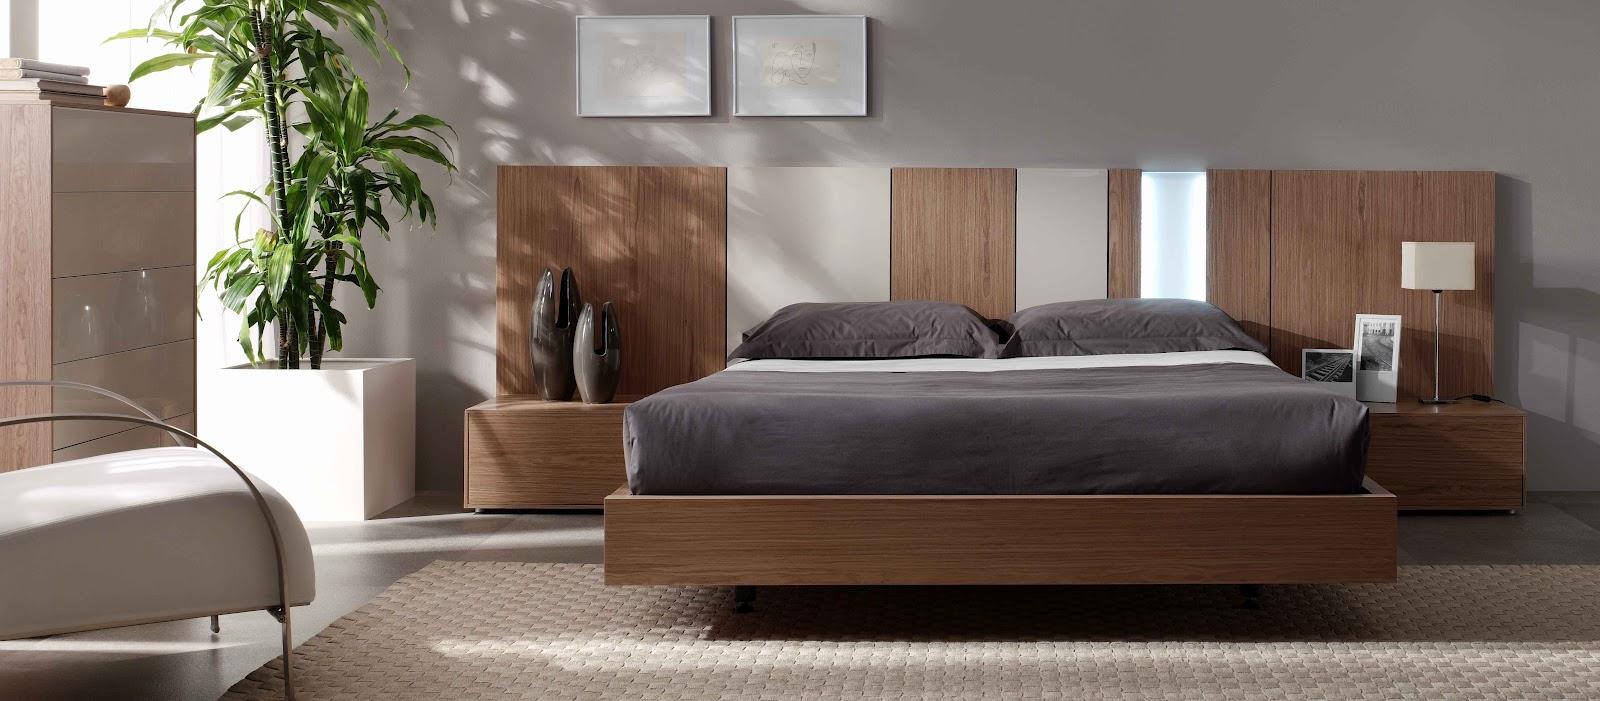 Muebles arranz dormitorios mobenia - Muebles para dormitorio matrimonial ...